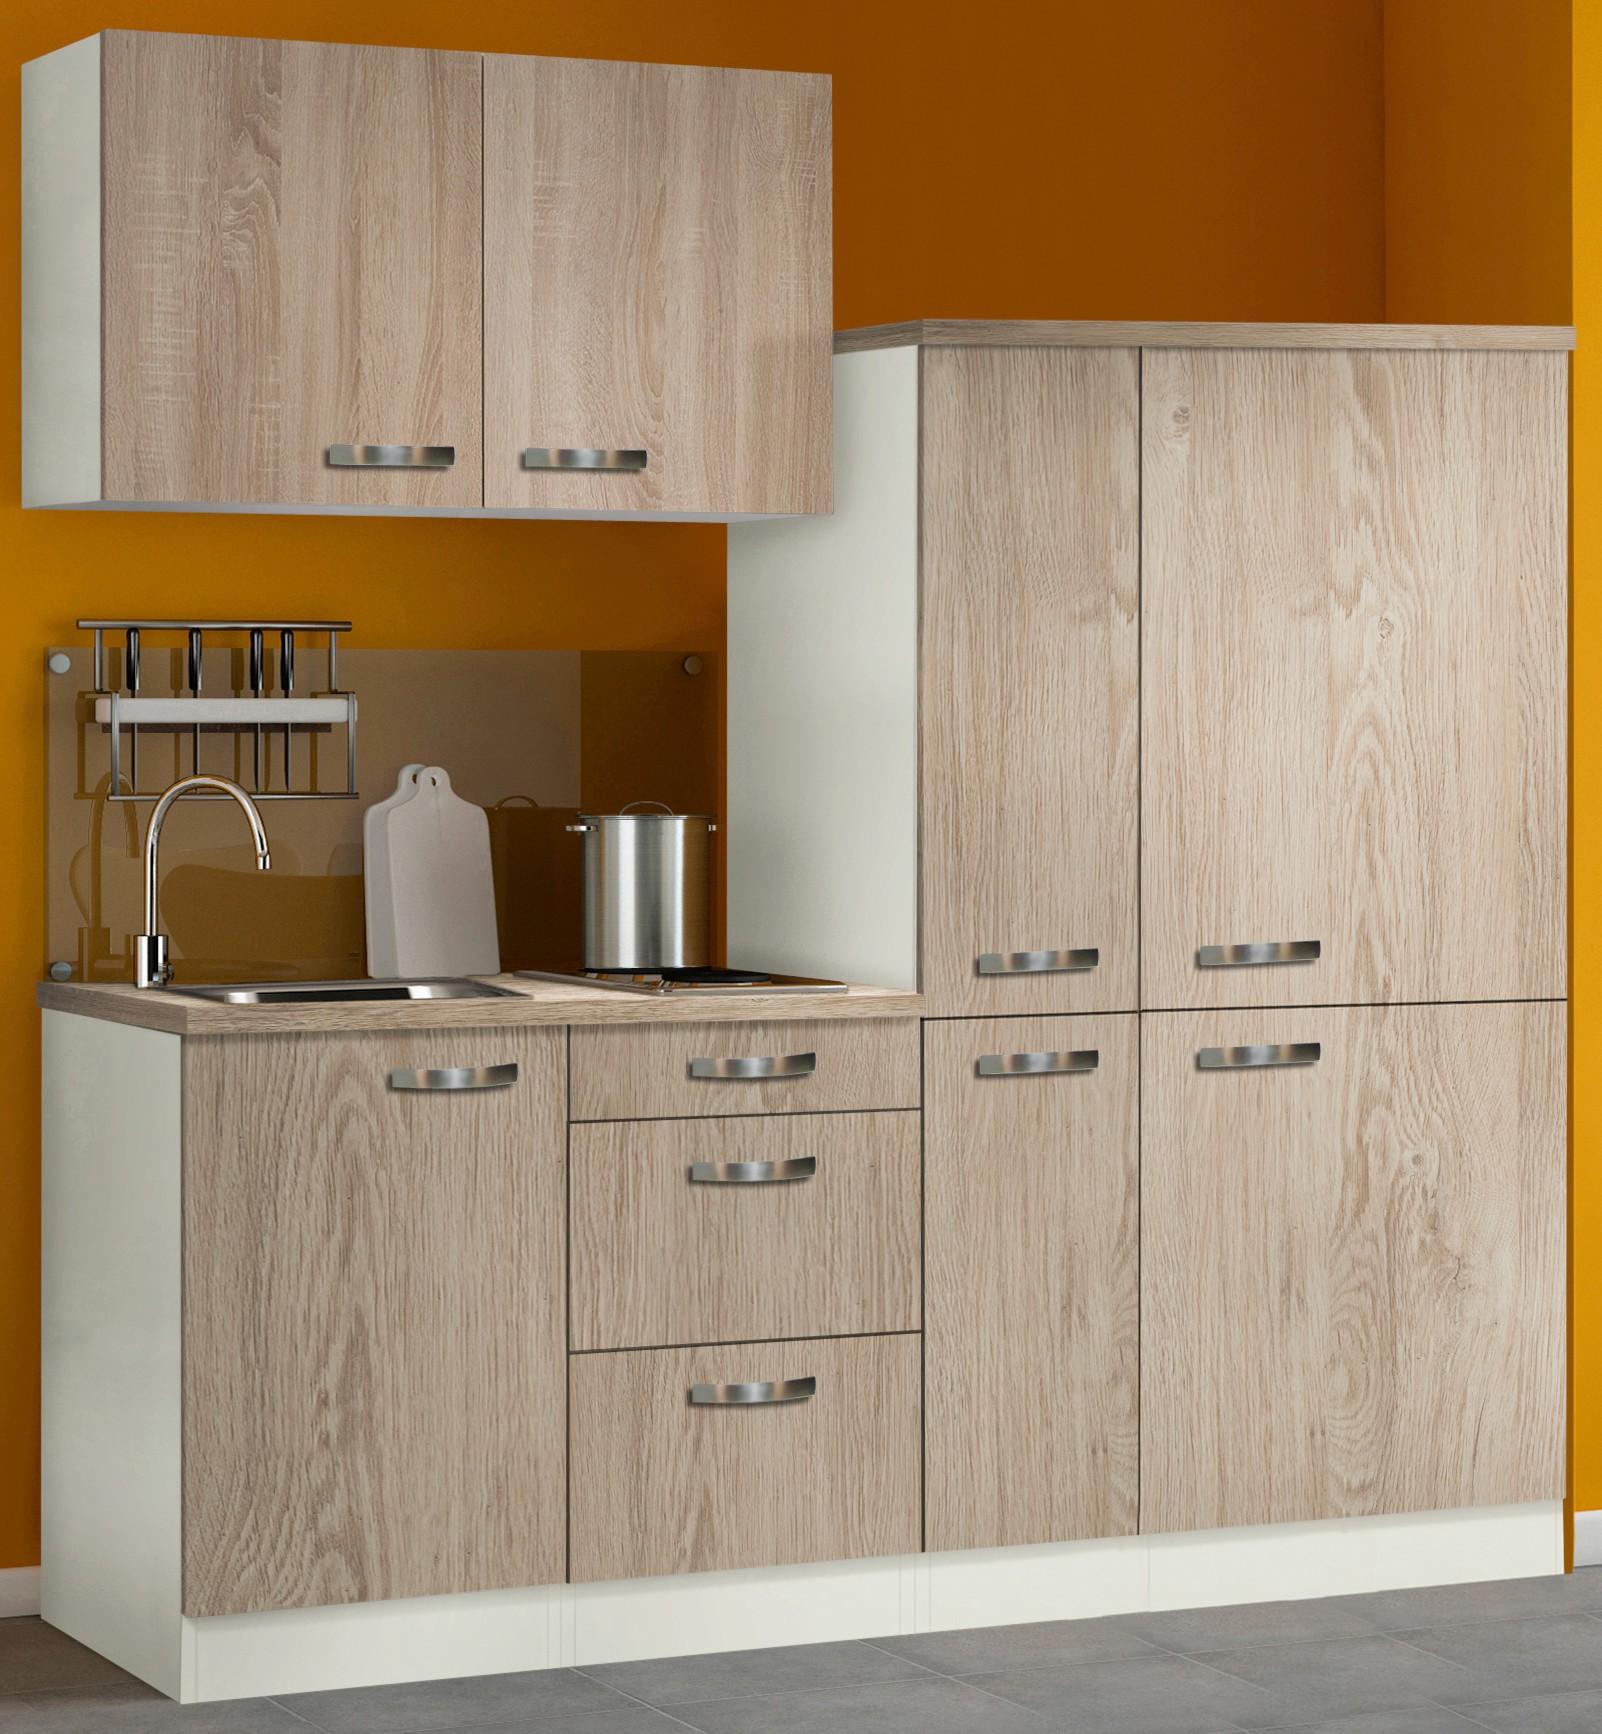 Singlekuche toledo mit elektro kochfeld breite 190 cm for Singleküche mit elektroger ten